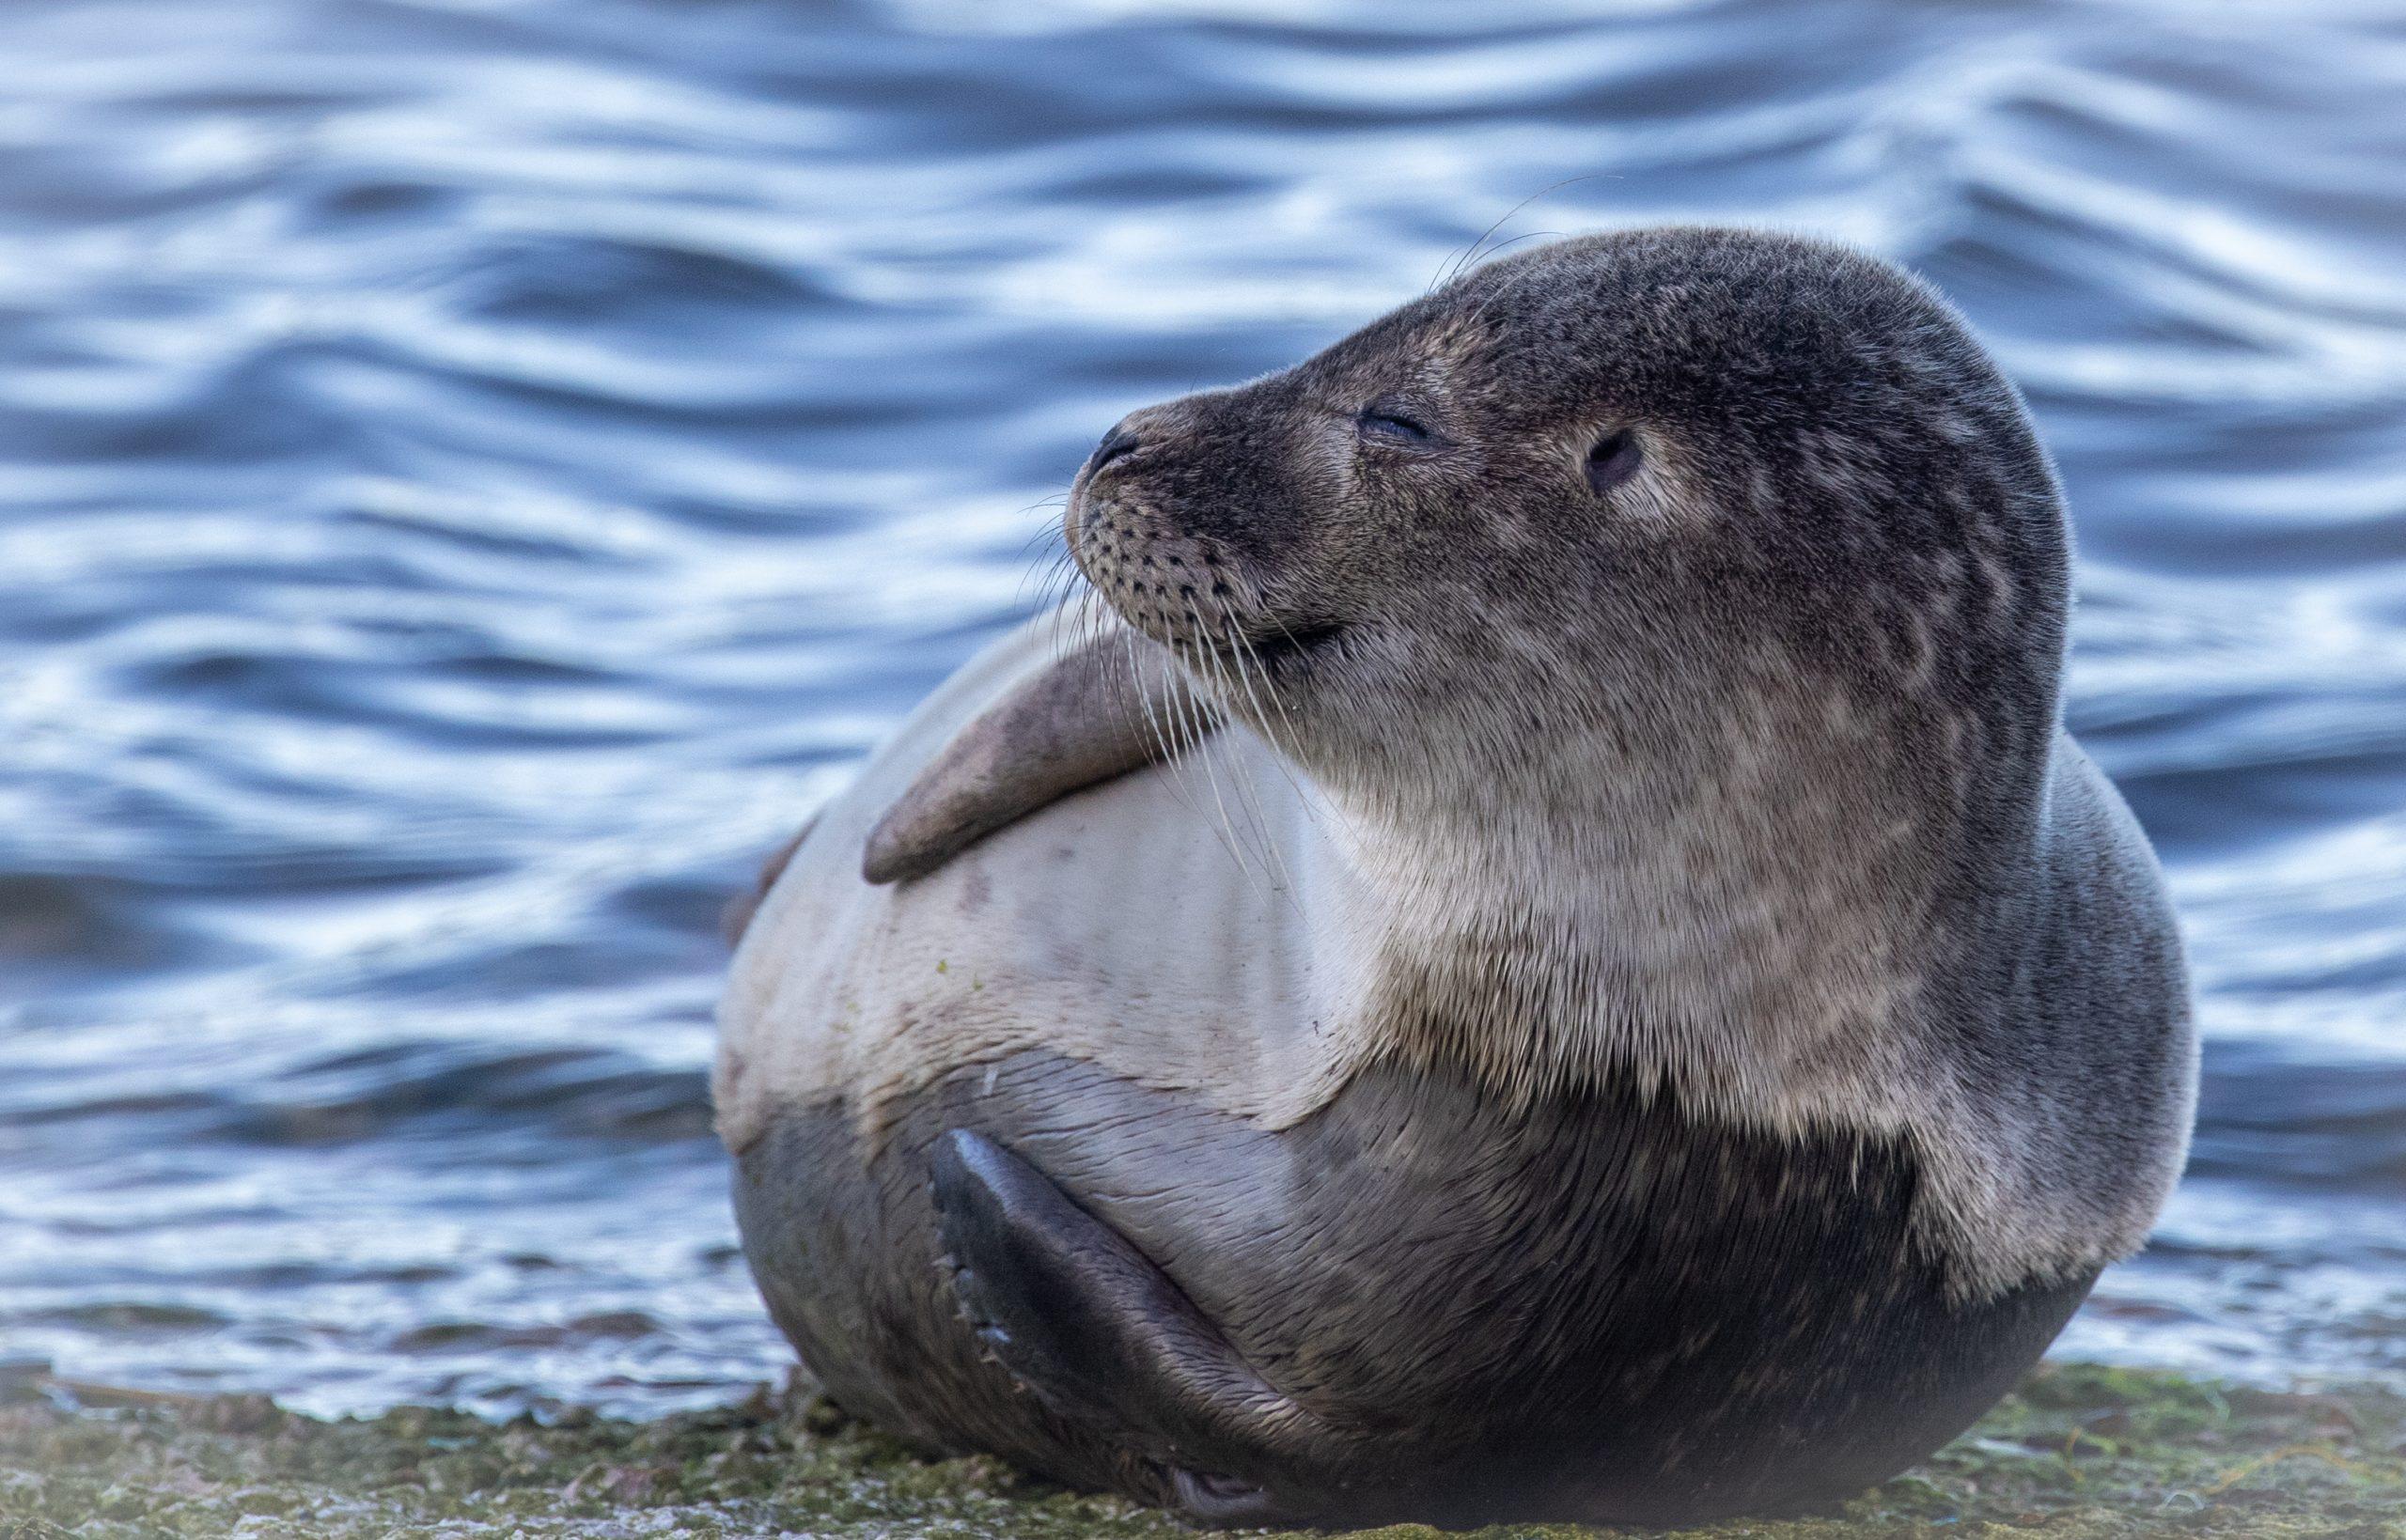 Larick Campsite - Nature Lovers - Seal pup